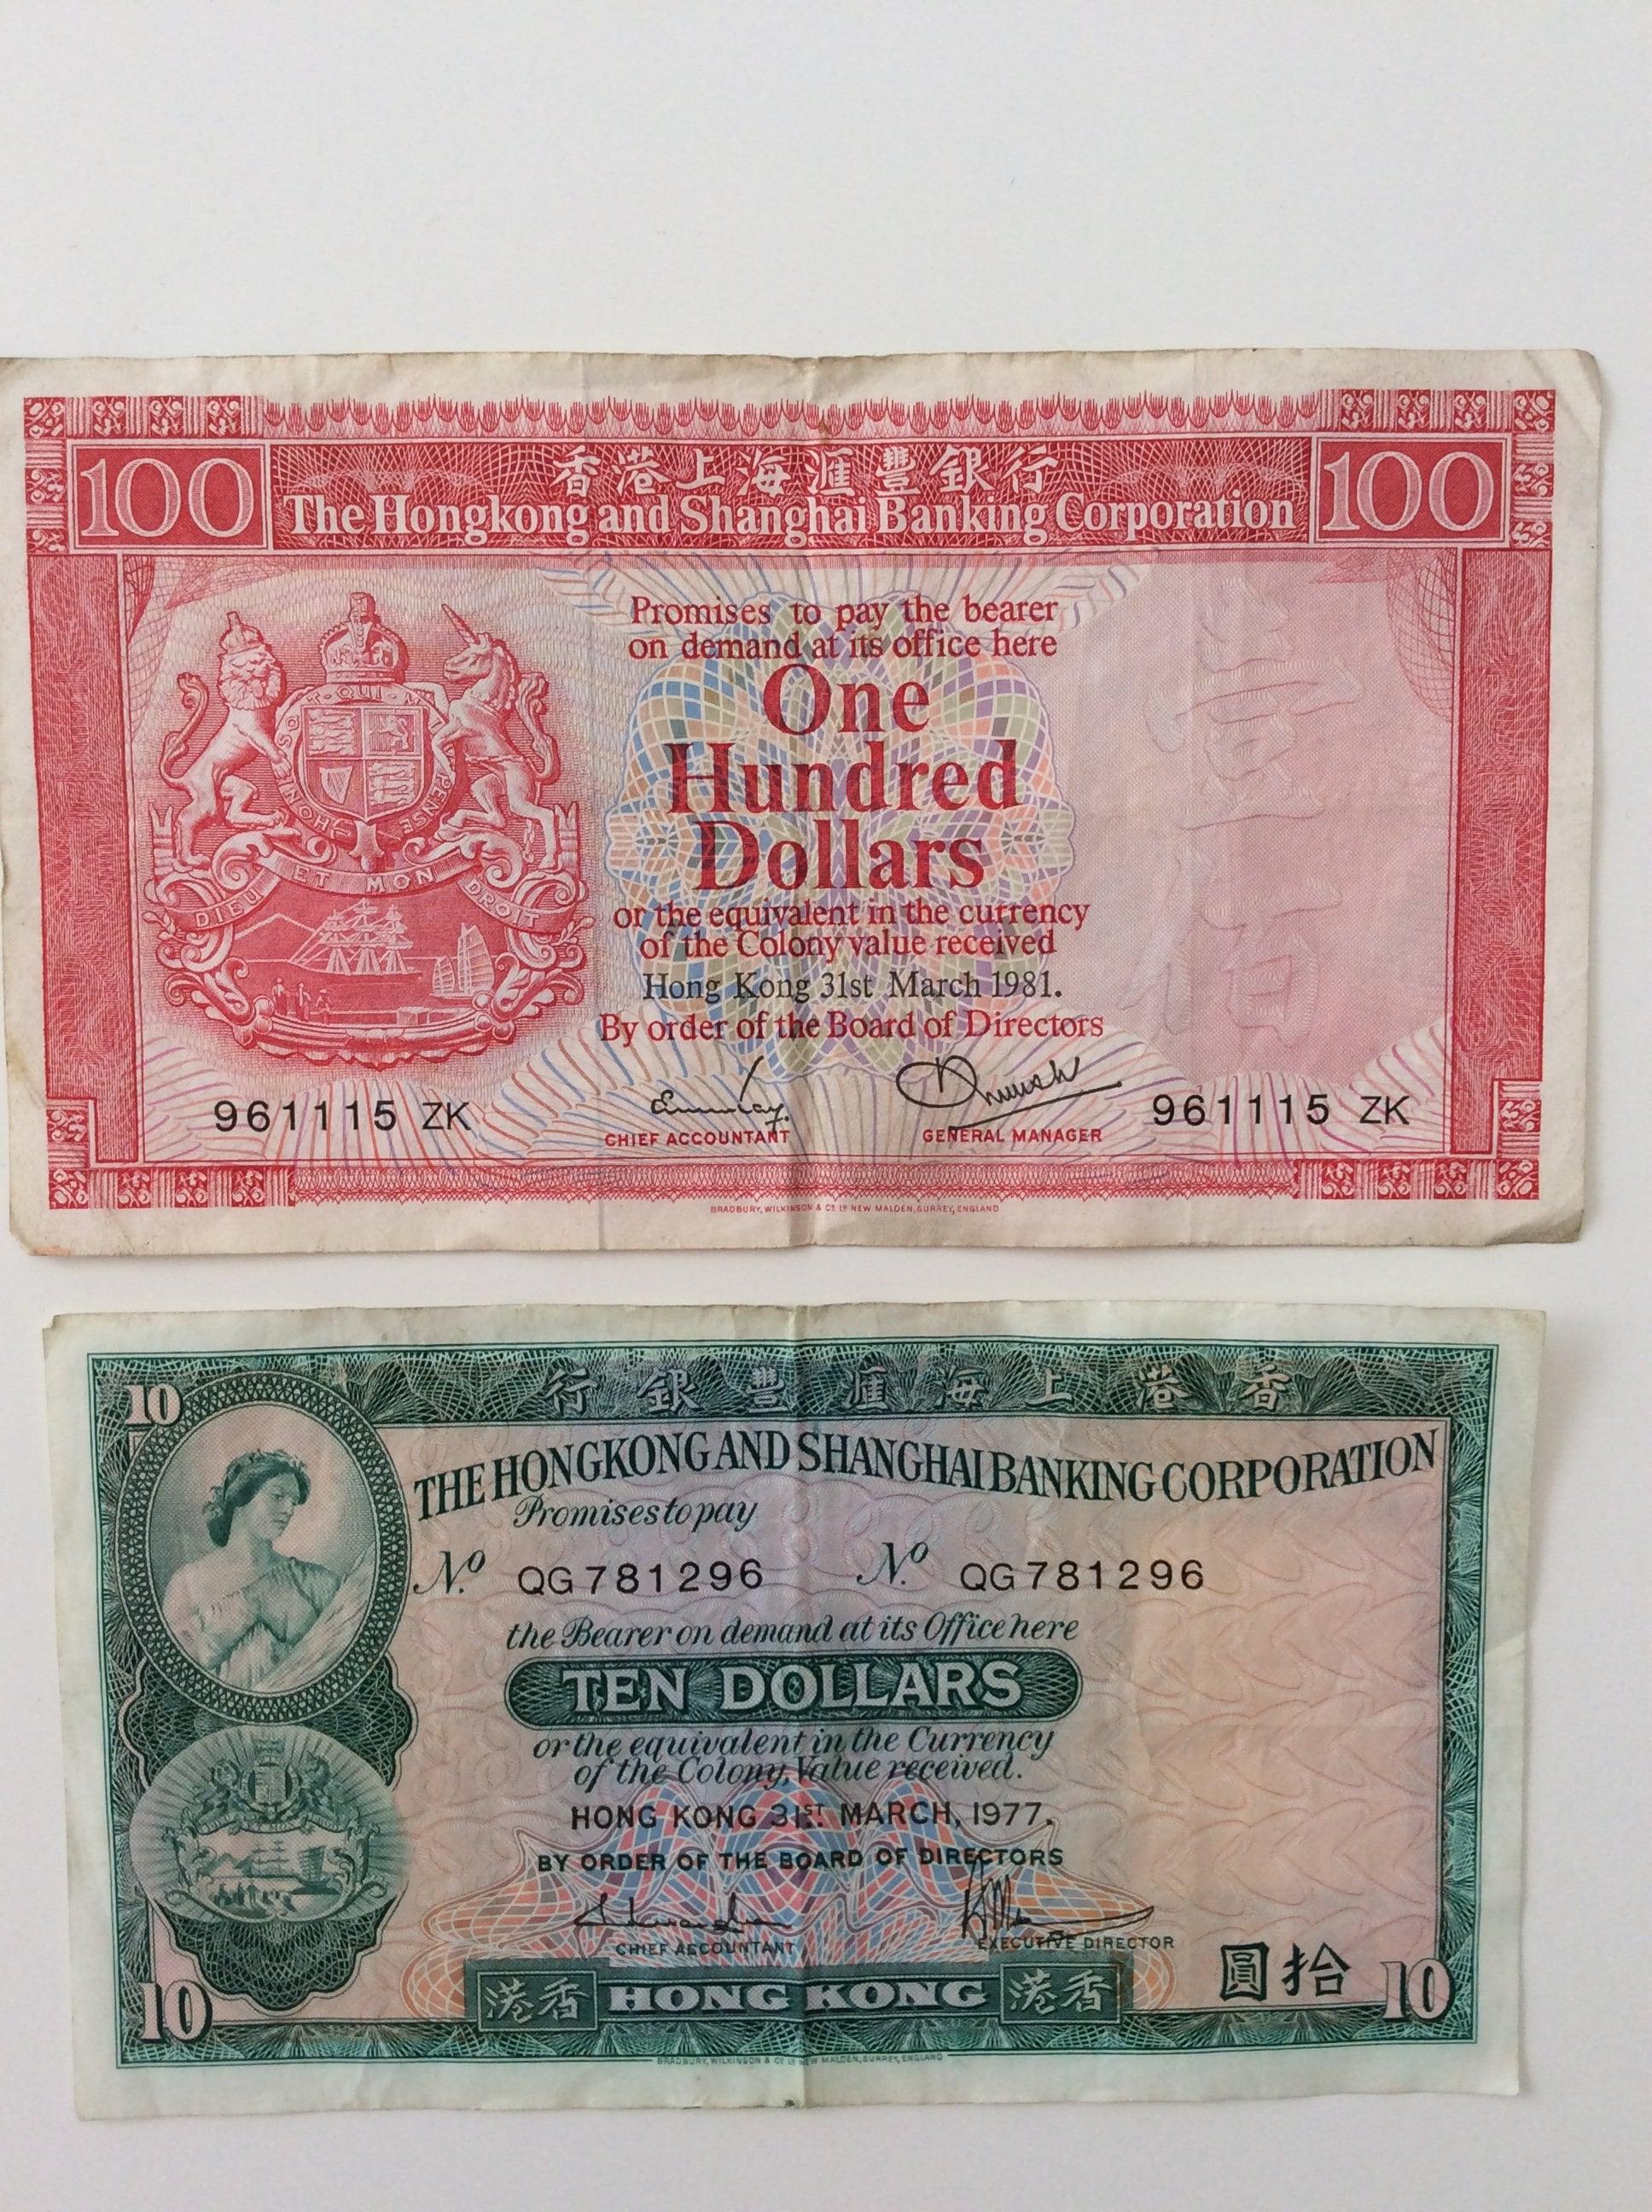 COLECCIÓN HONG KONG dólares moneda billetes moneda de curso